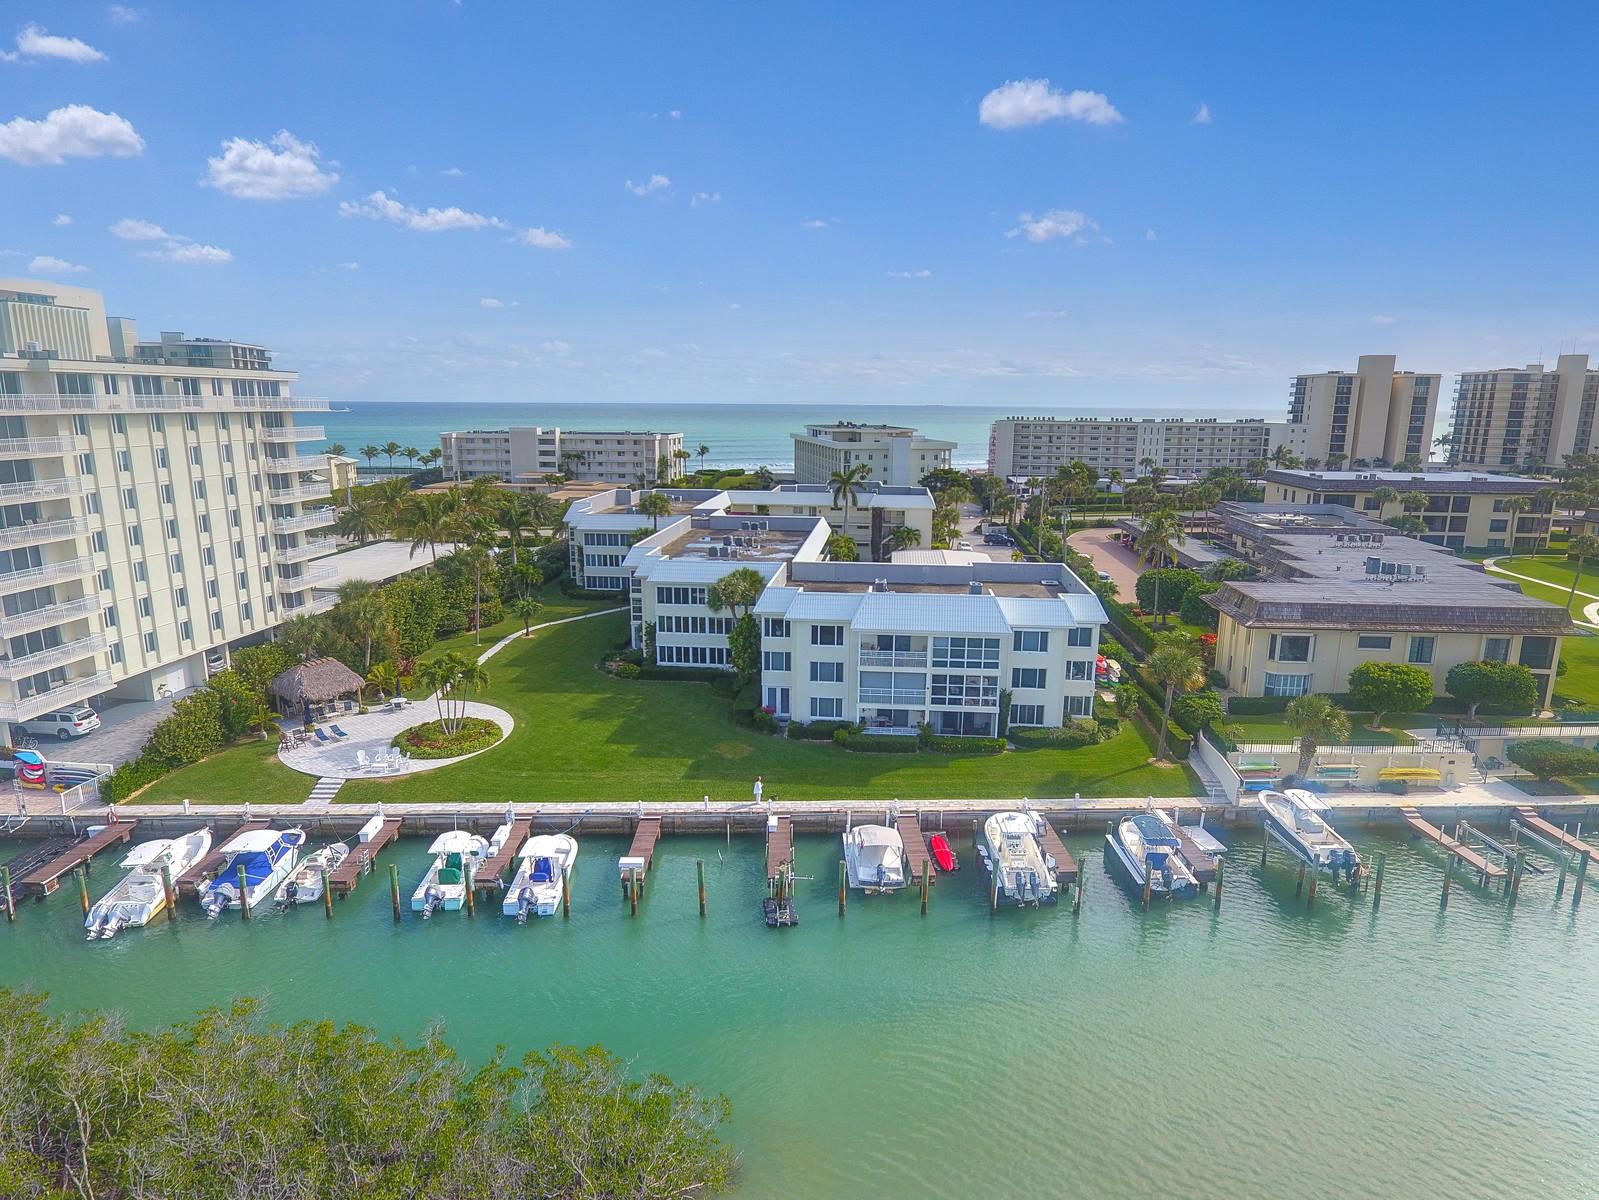 325 Beach Road, Tequesta, Florida 33469, 2 Bedrooms Bedrooms, ,2 BathroomsBathrooms,Condo/Coop,For Sale,Island House South West,Beach,1,RX-10501088